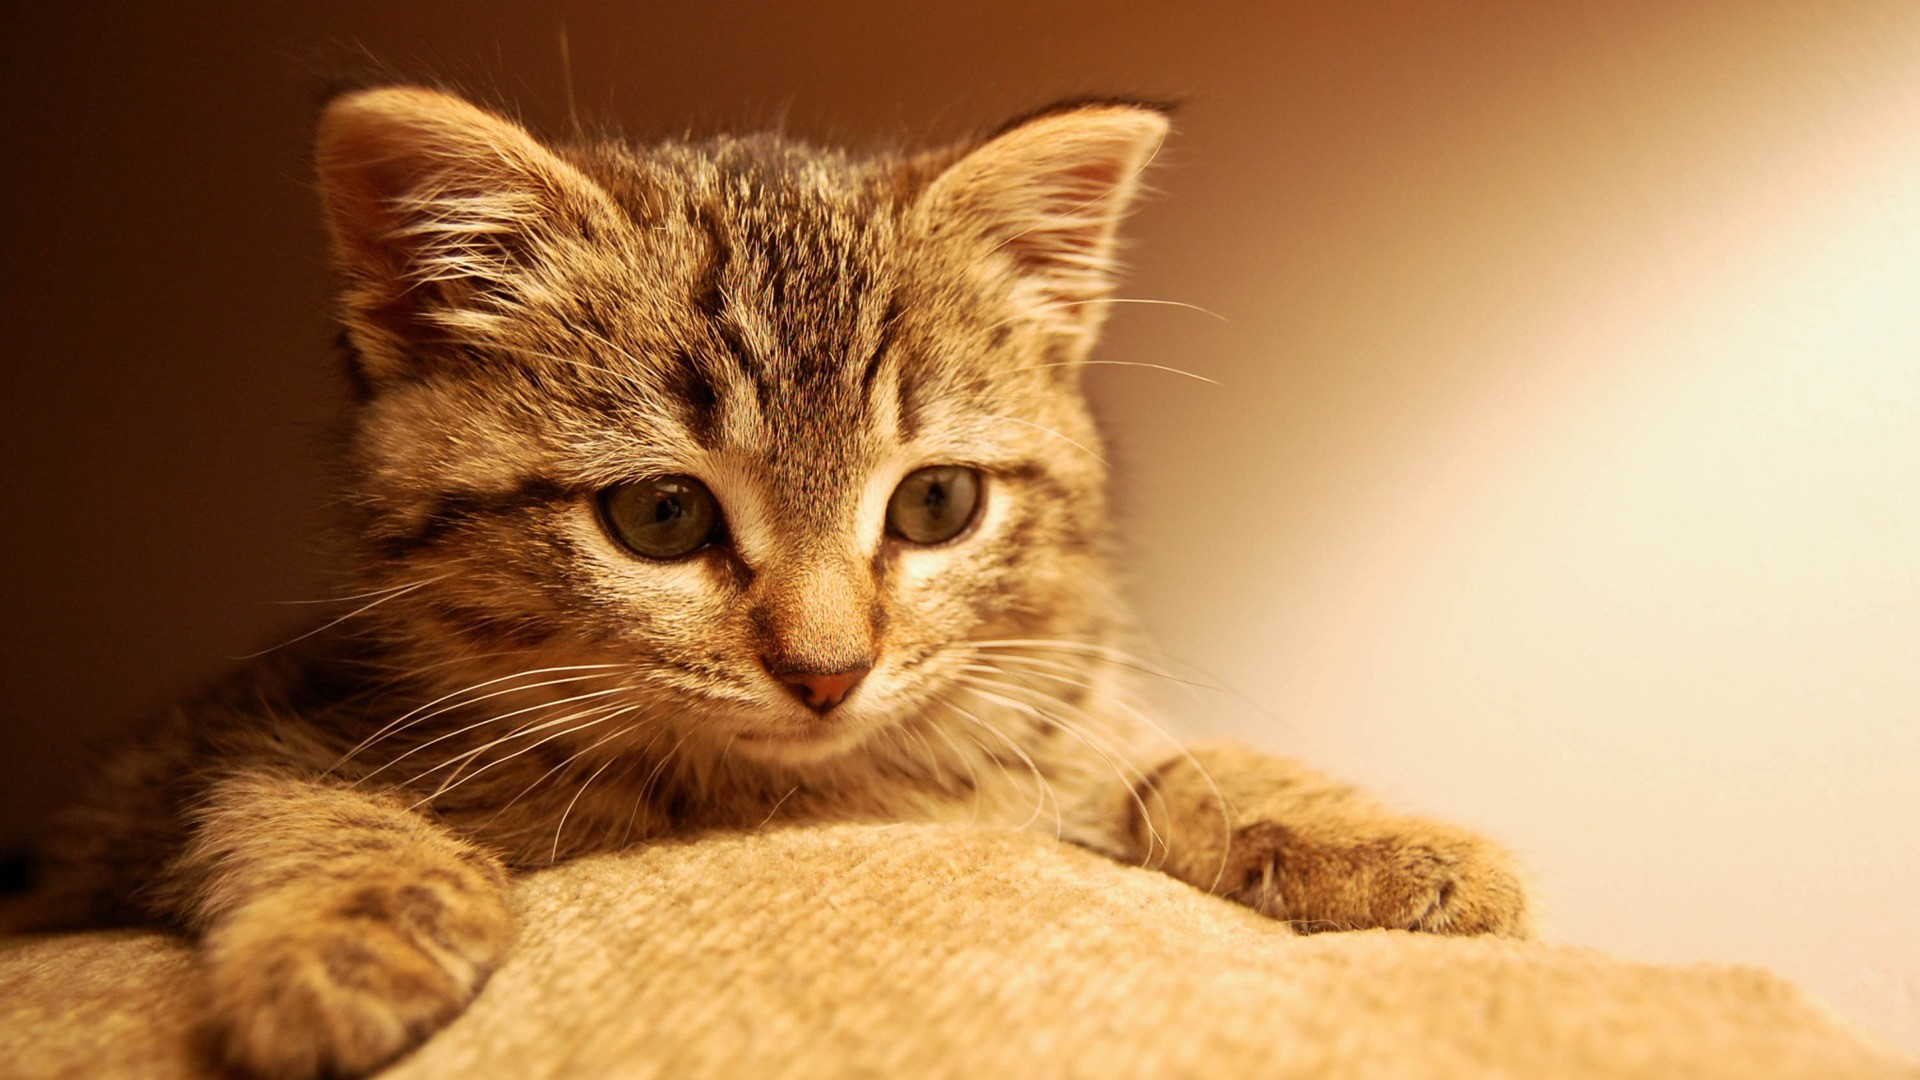 Cat Wallpapers 1920×1080 (65 Wallpapers) – HD Wallpapers Hd Wallpaper 1920 X 1080 Kittens